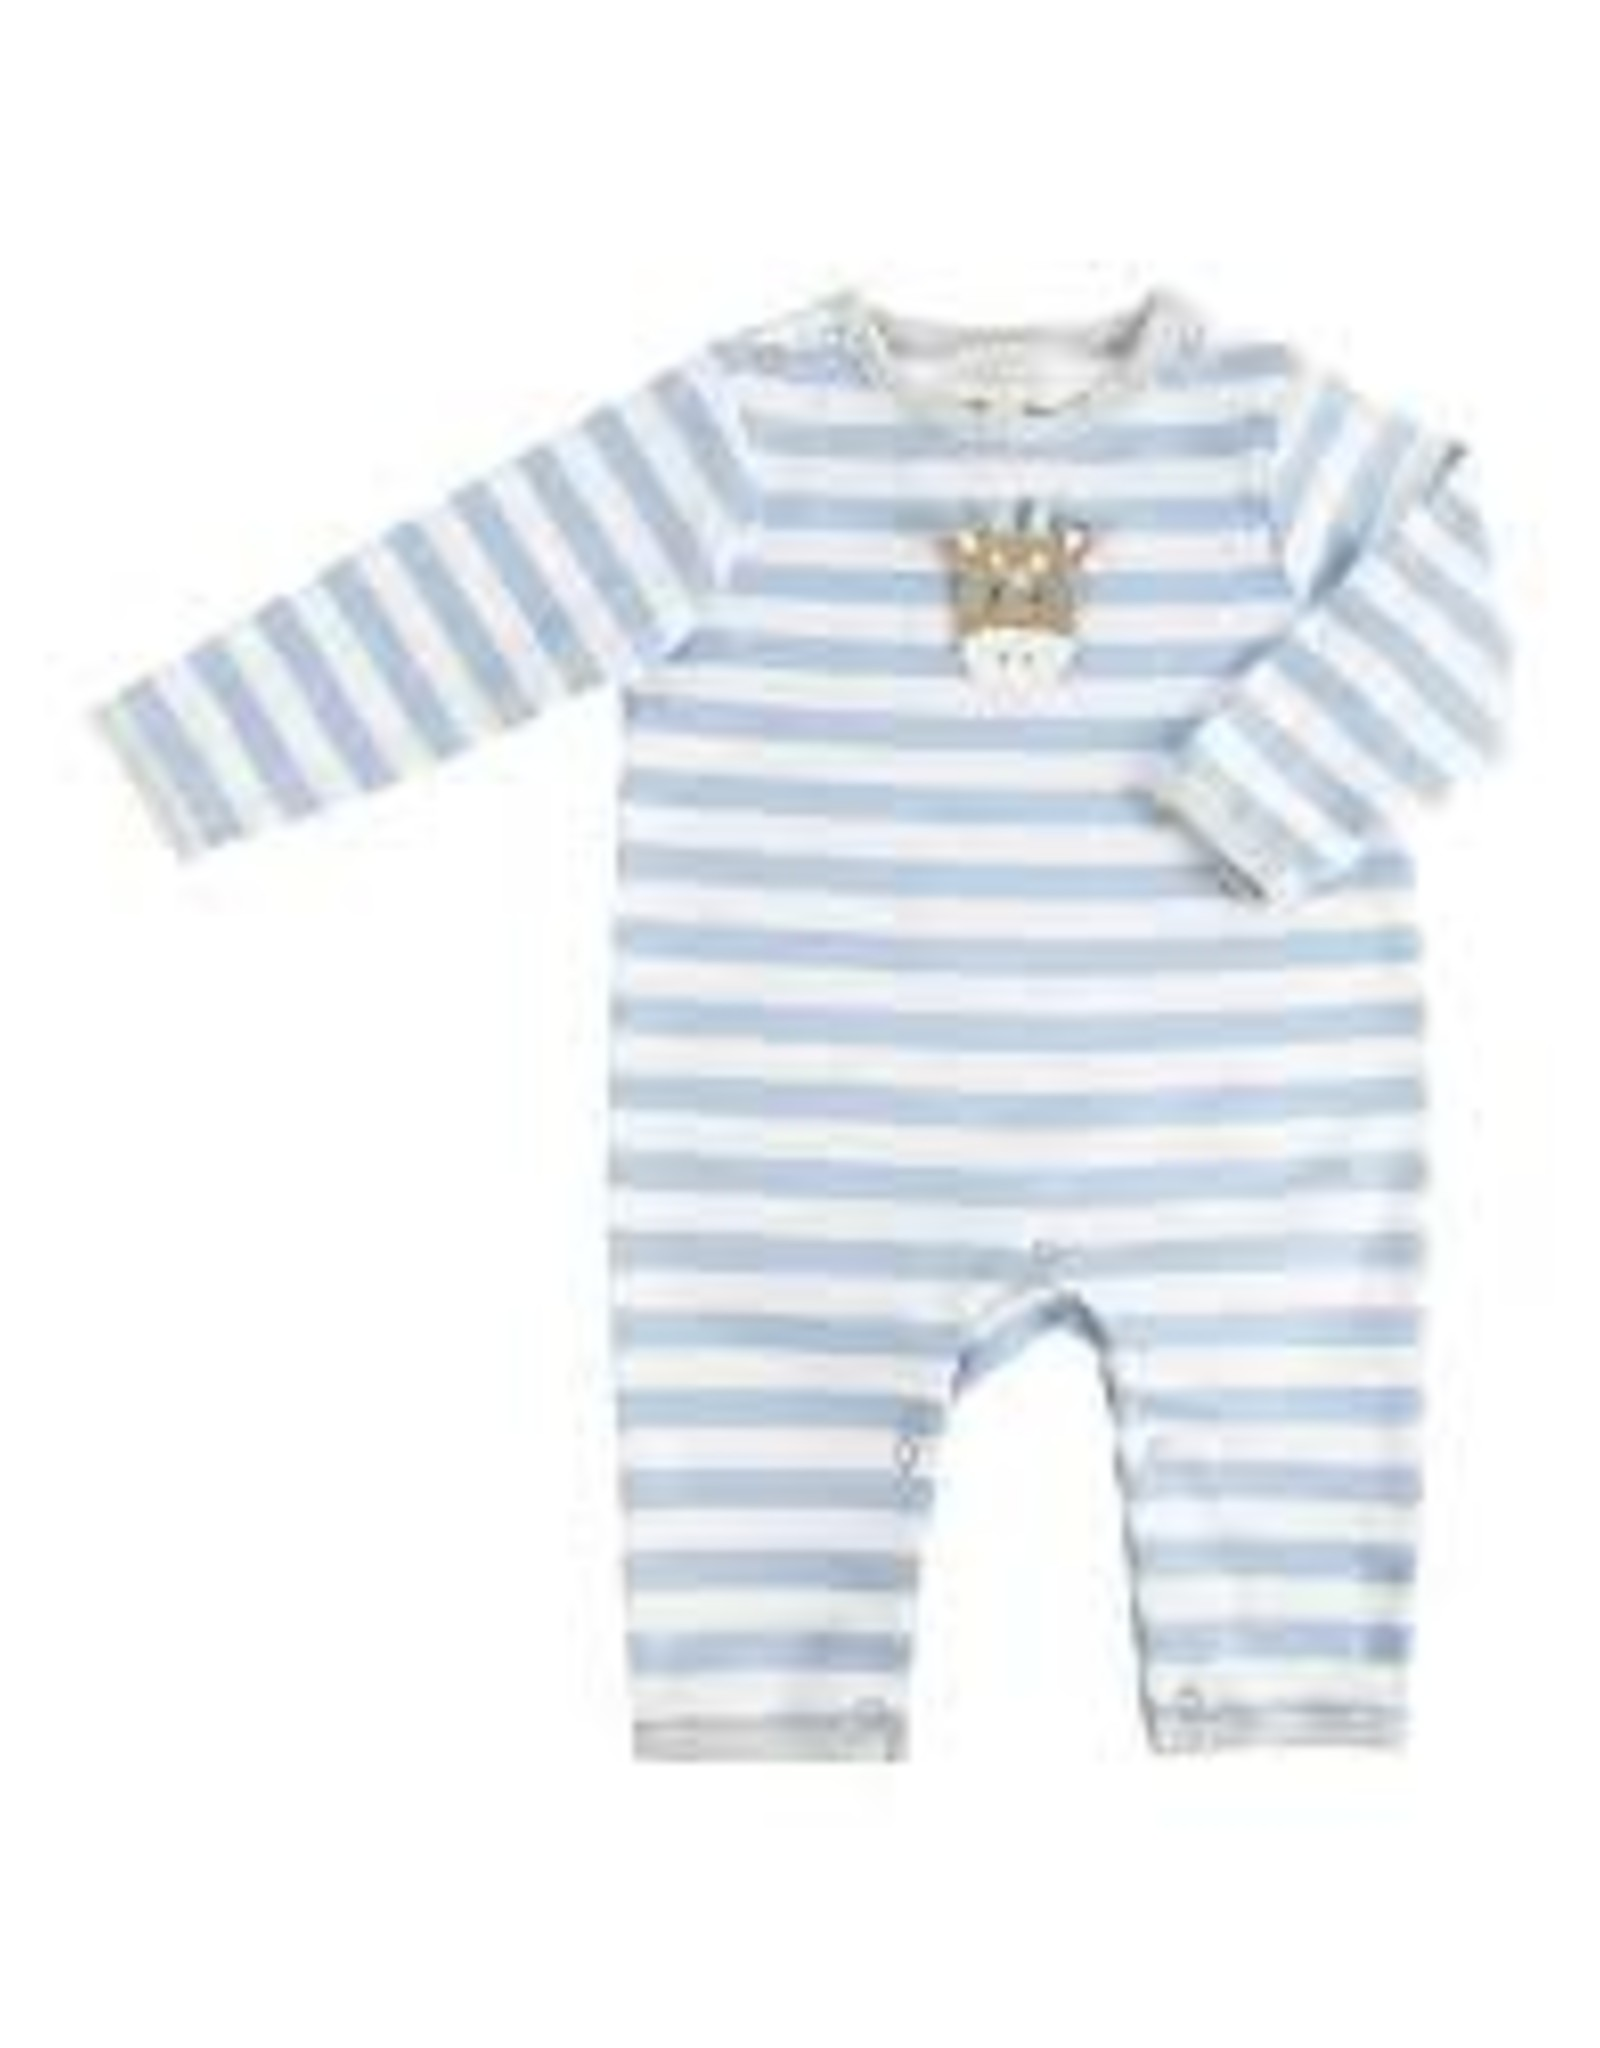 EFL Sales Babygro Bodysuit